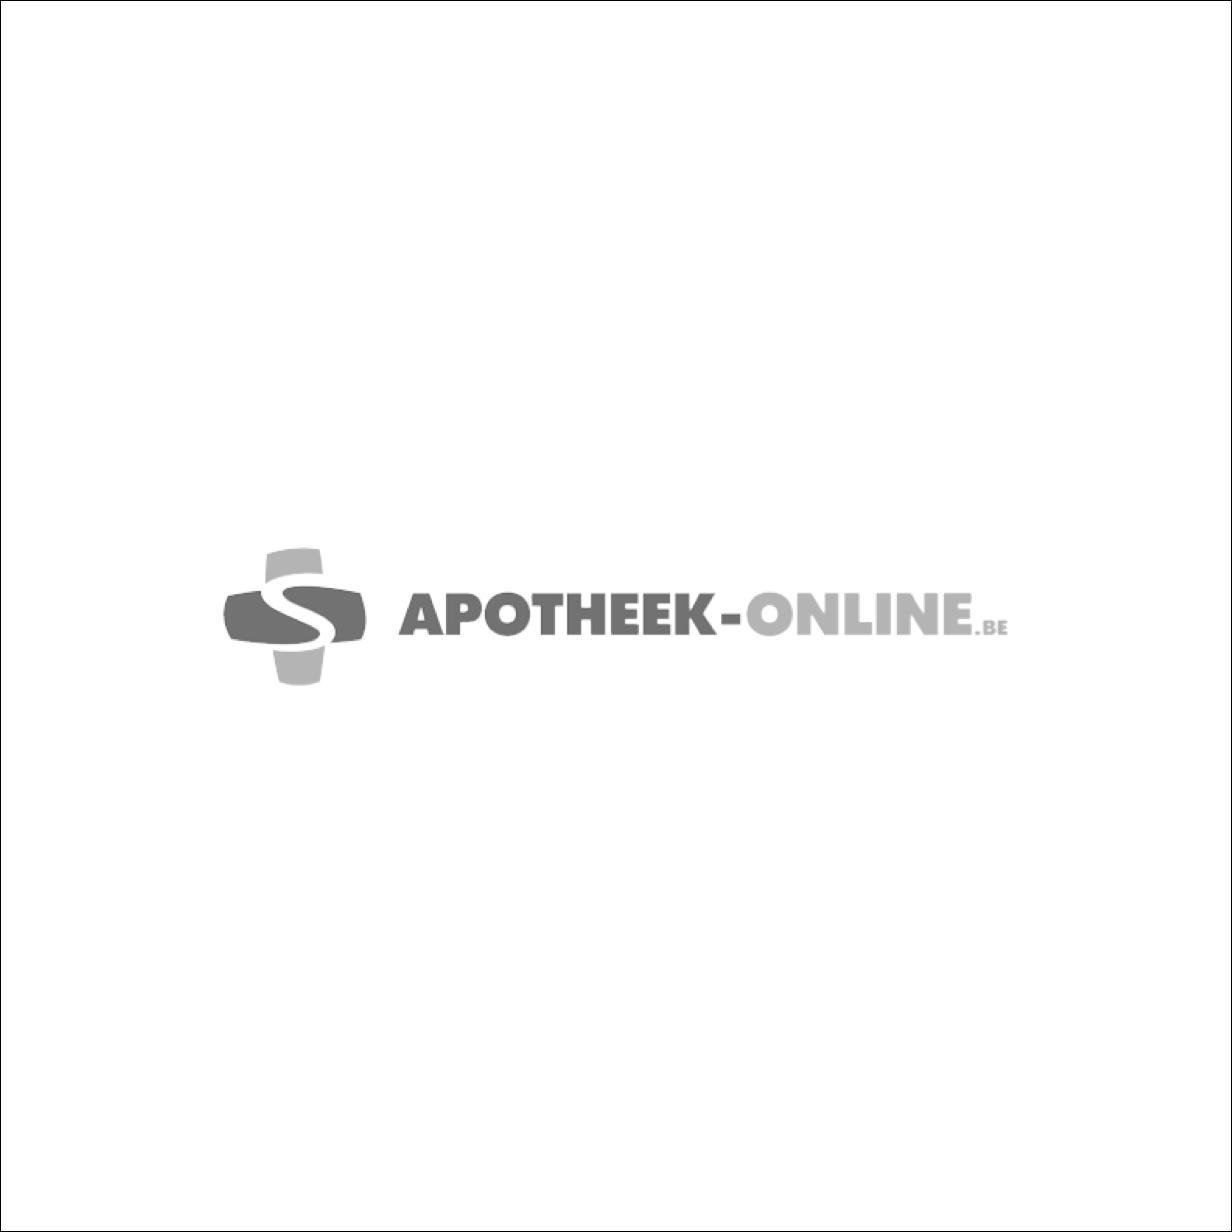 GAZIN CP N/STER 12P 7,5X 7,5CM 100 18504